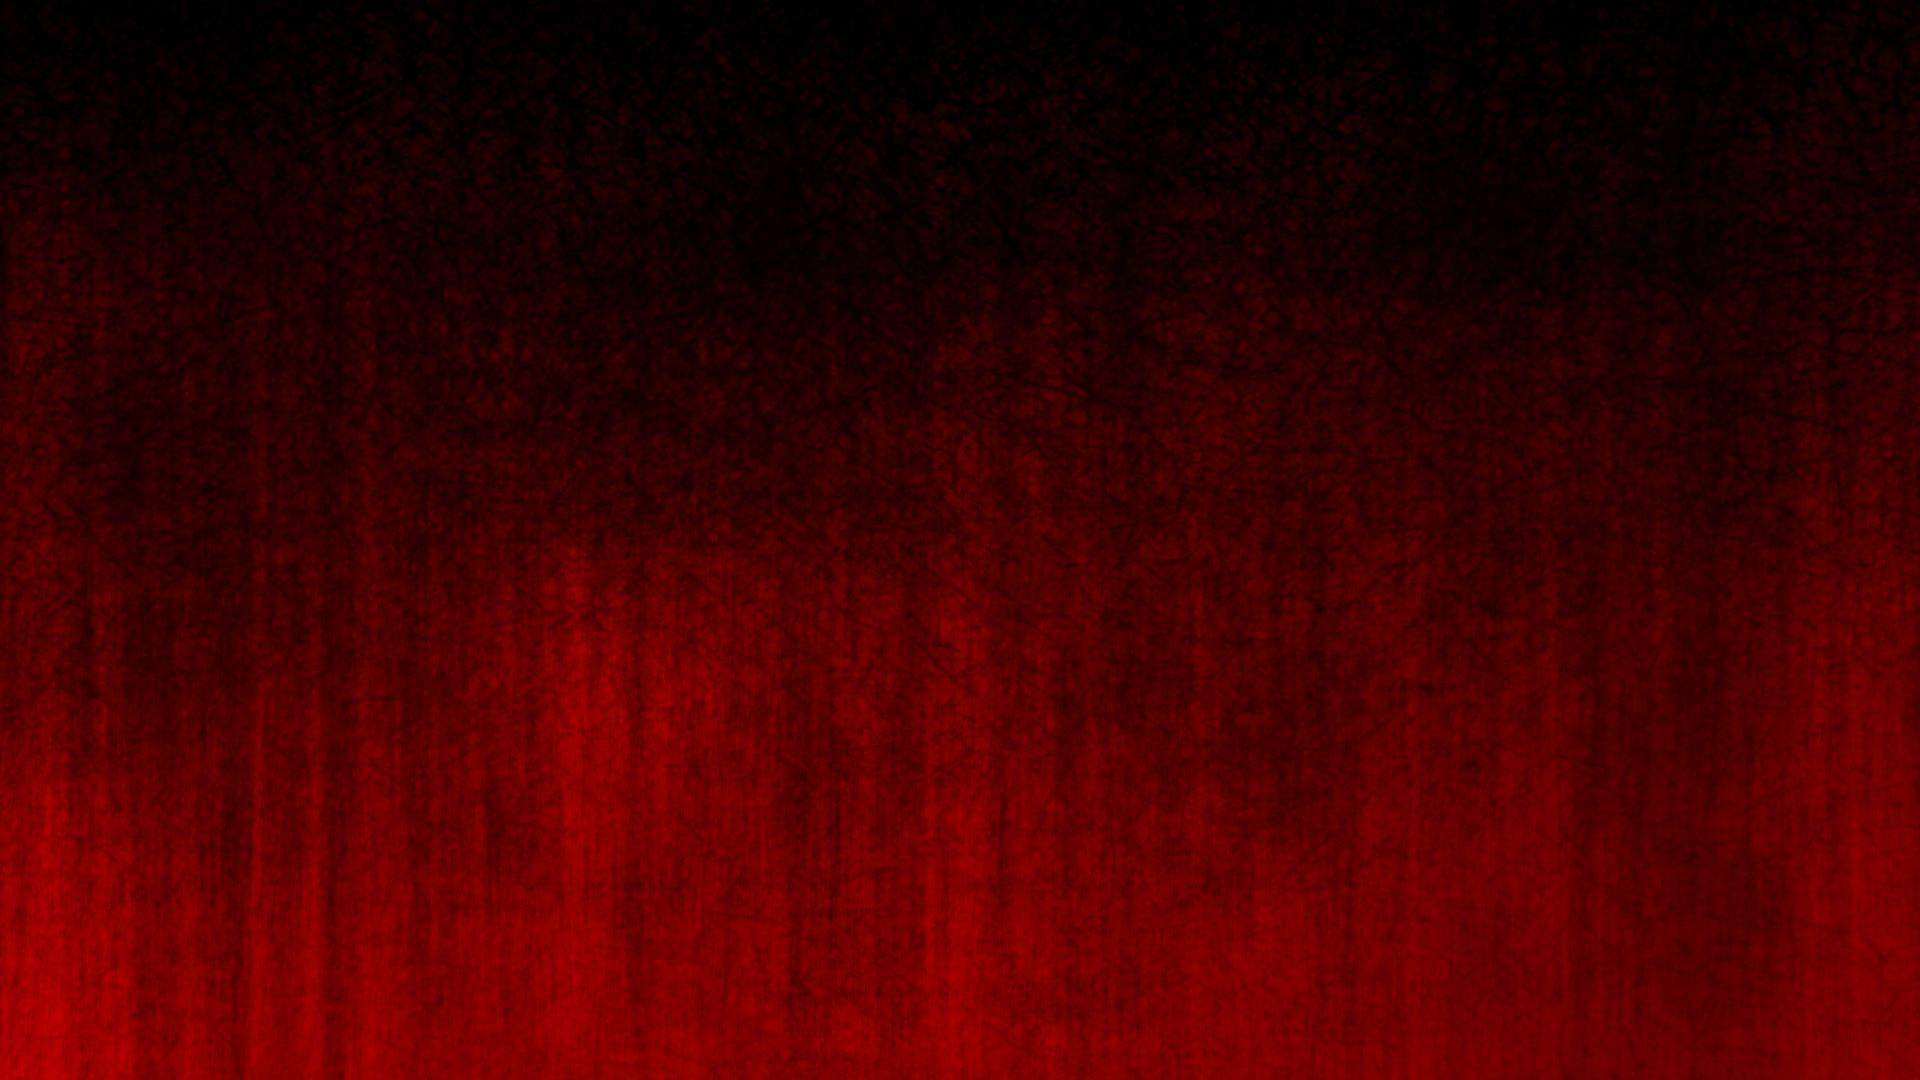 Red Grunge Wallpaper (50+ images)